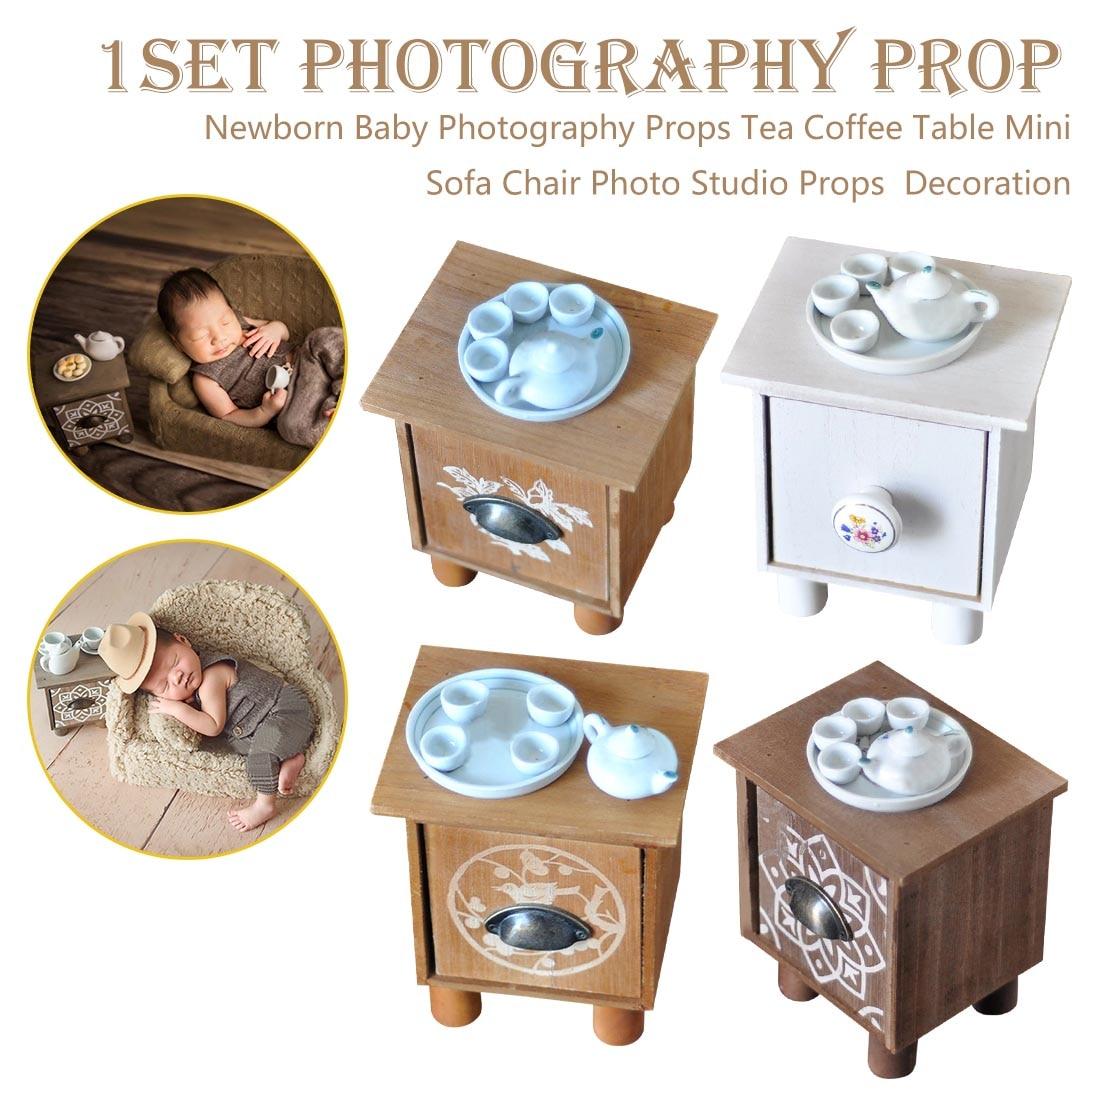 Utilería de estudio de tiro Infantil accesorios de fotografía de bebé recién nacido conjunto de té para mesa posando Mini silla Decoración Accesorios de fotografía